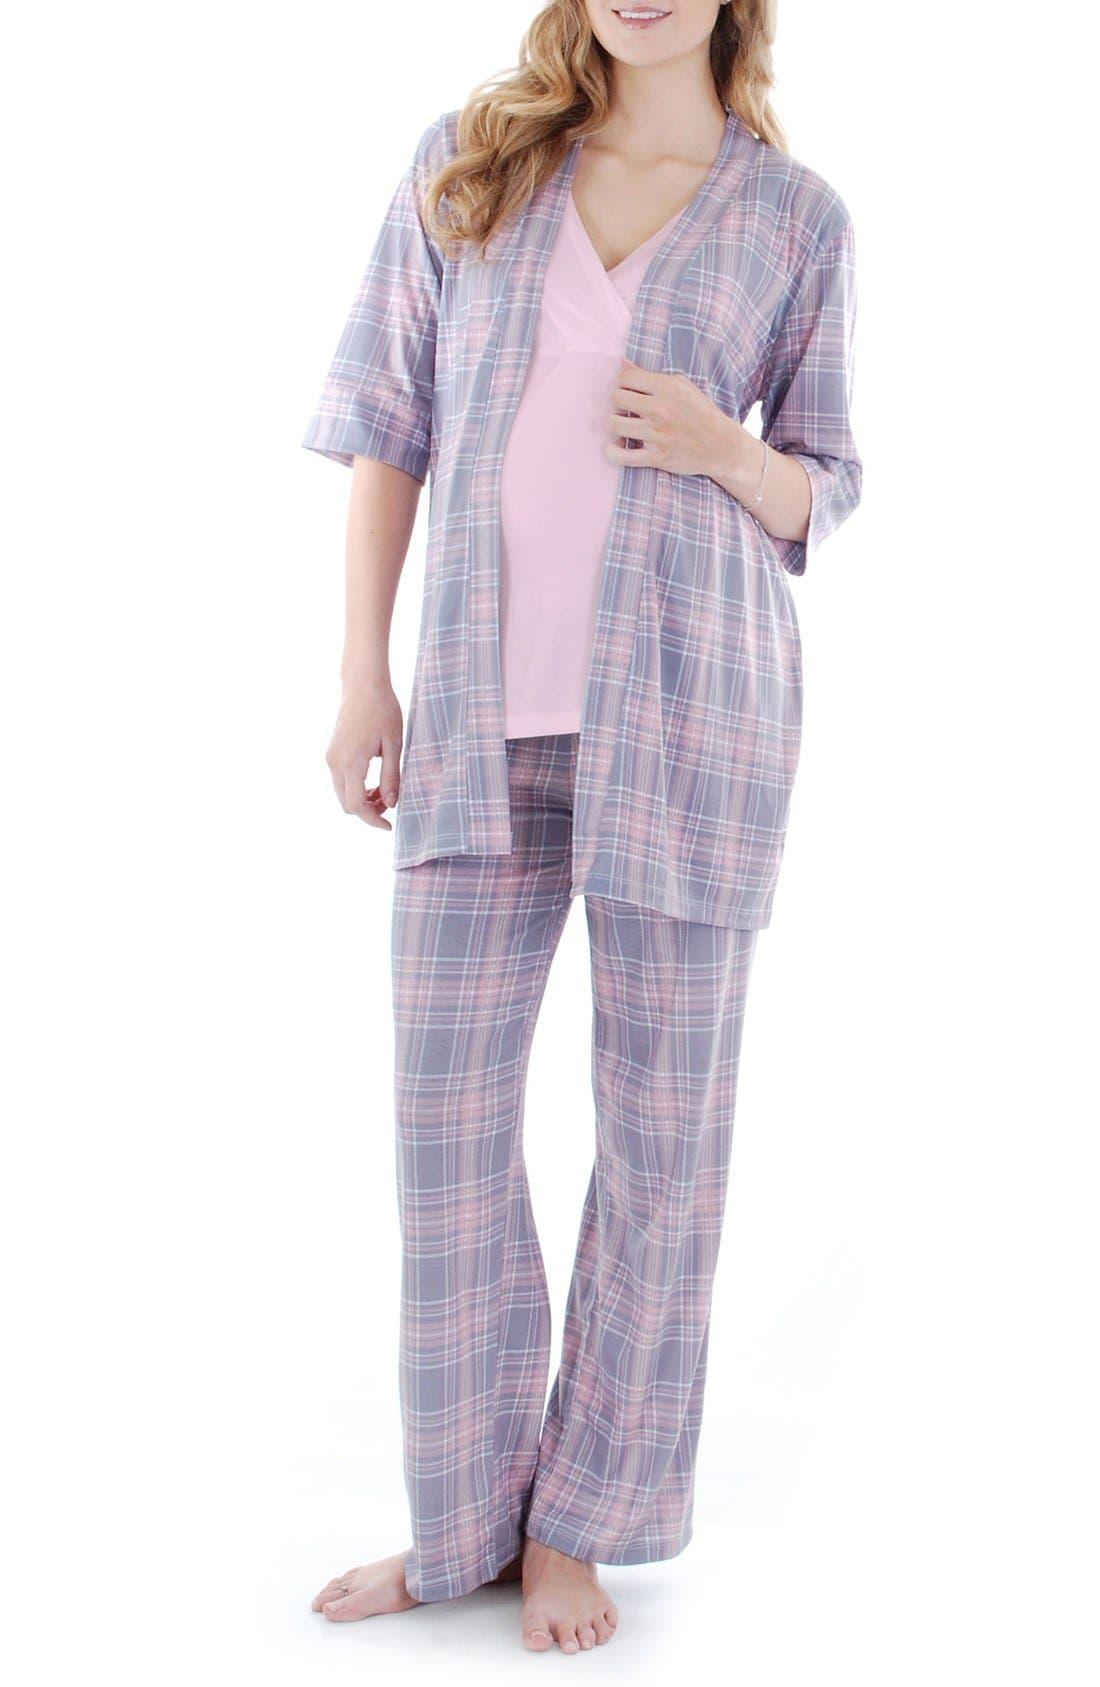 Susan 5-Piece Maternity/Nursing Pajama Set,                             Main thumbnail 1, color,                             Pink Plaid